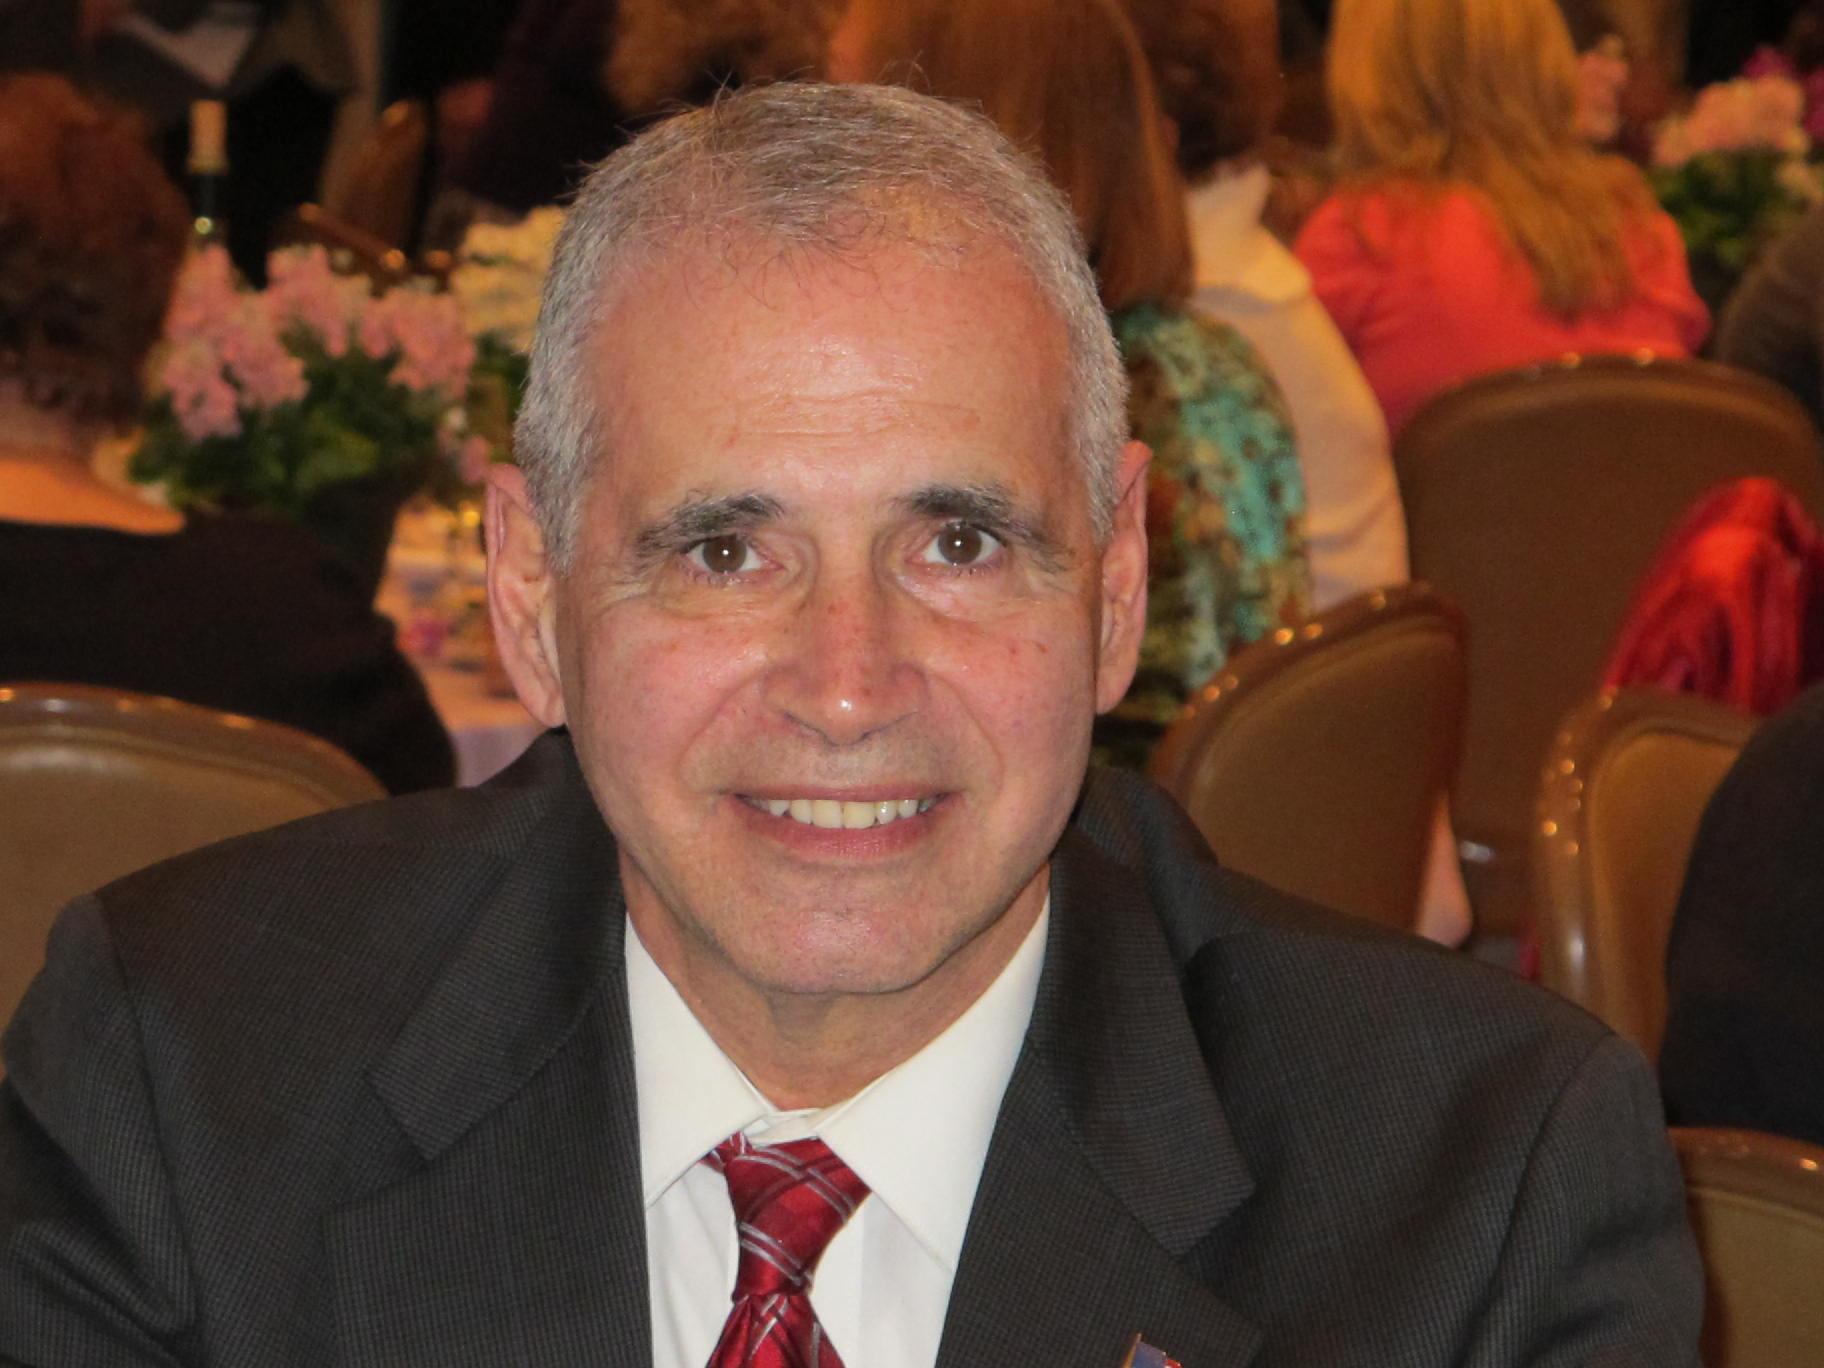 Hon. George M. Heymann is a retired New York City Housing Court judge. Photo courtesy of George M. Heymann.